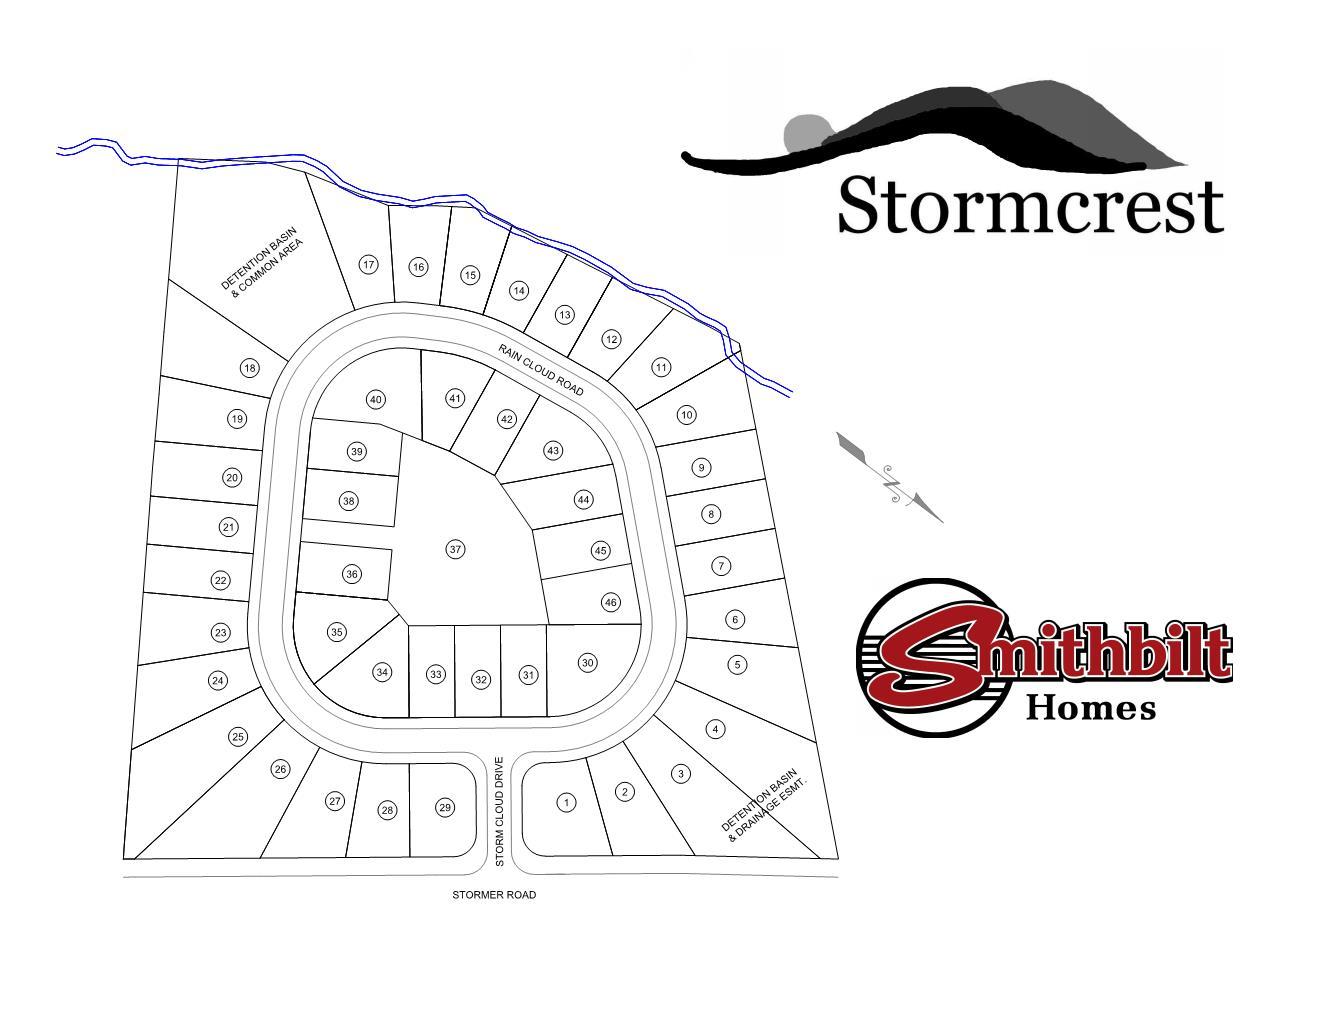 Stormcrest